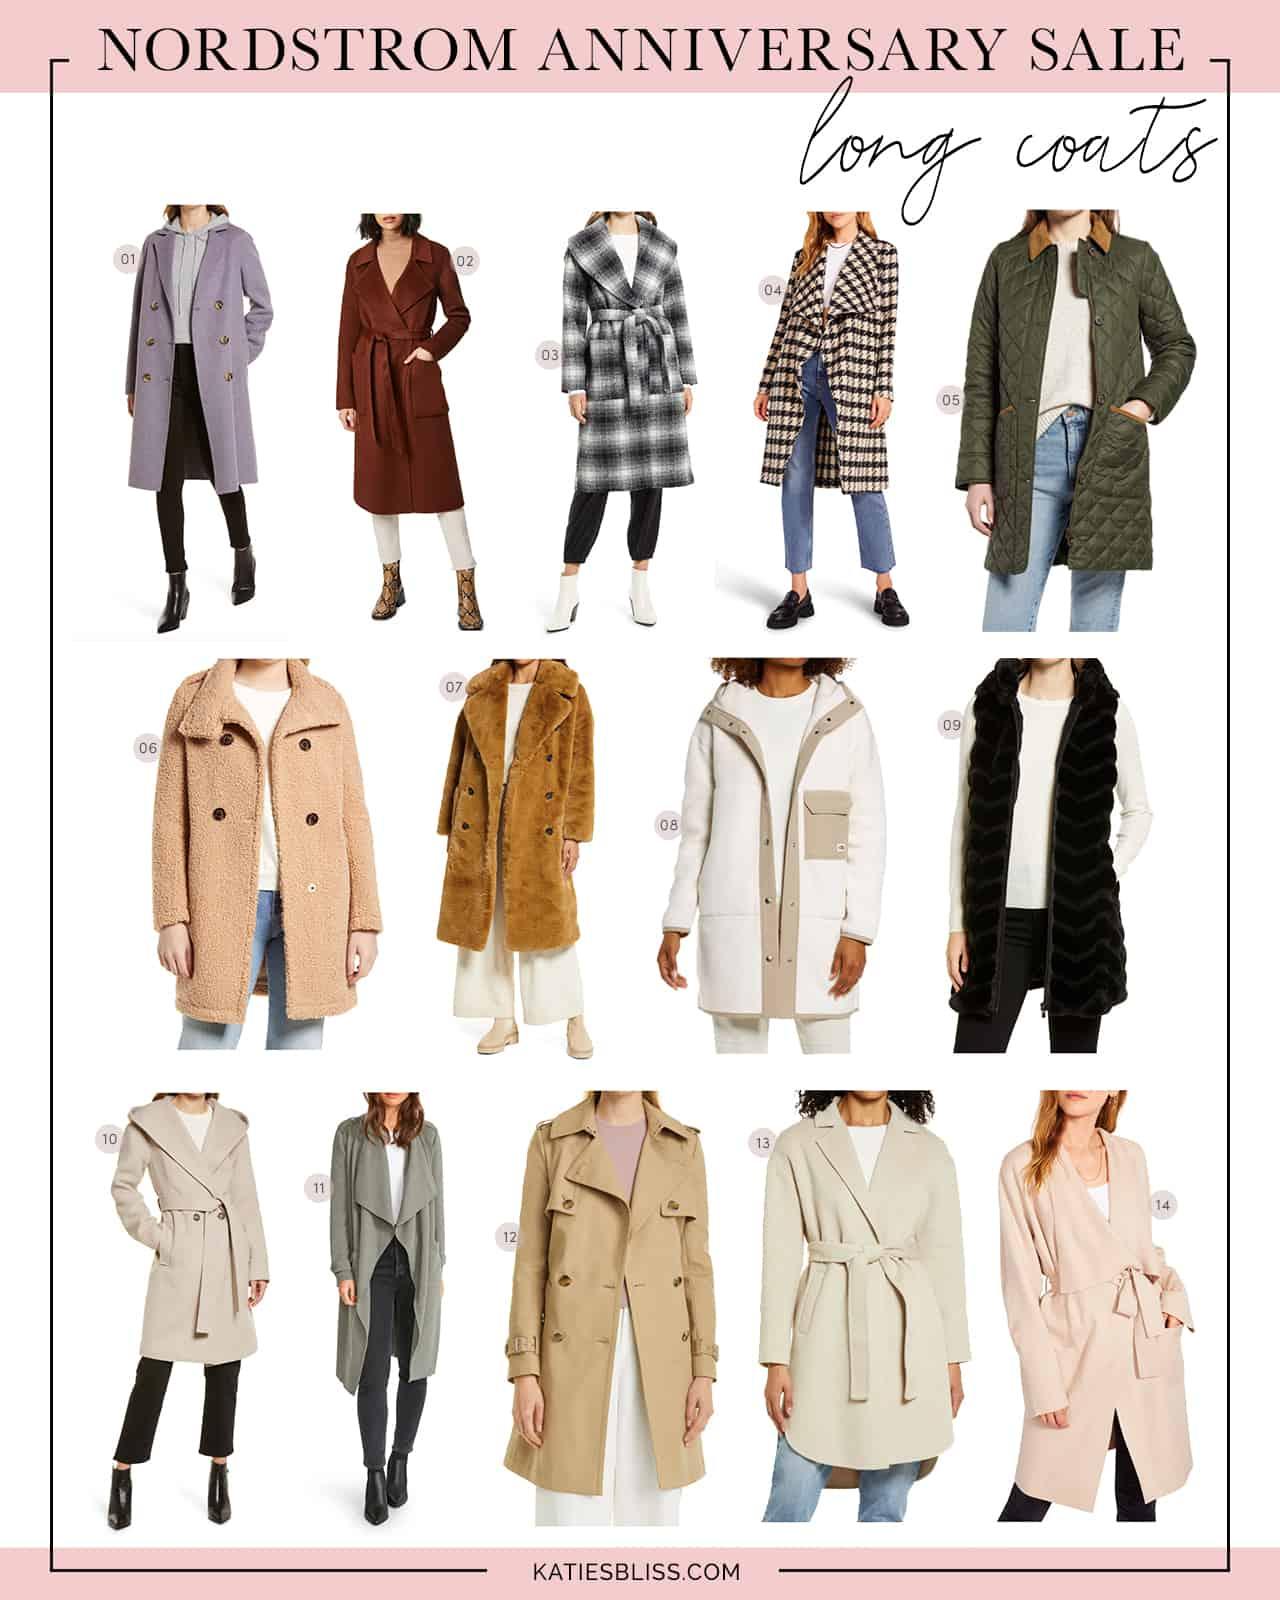 Nordstrom Anniversary Sale Long Coats